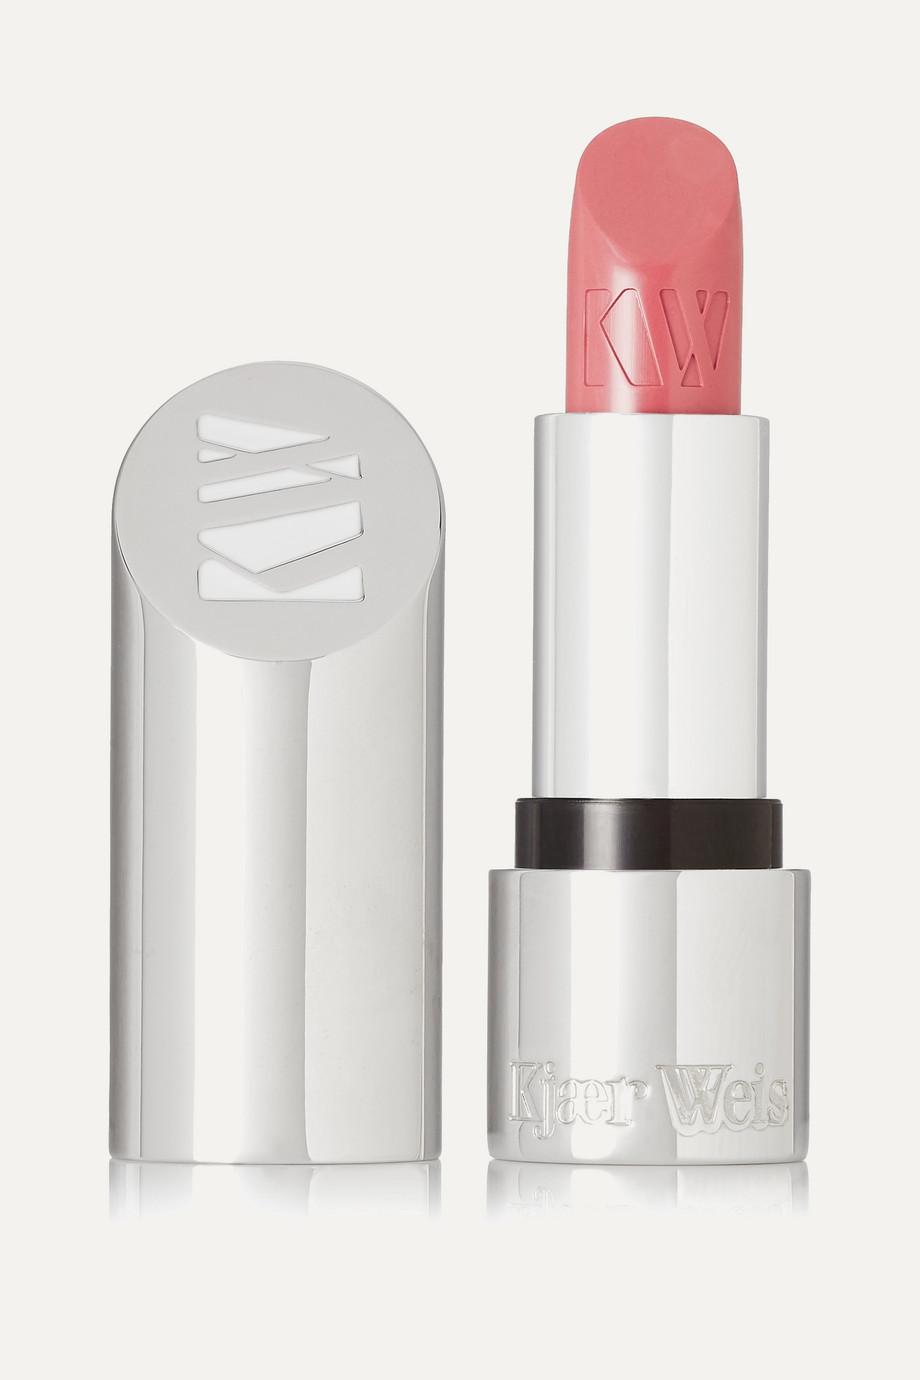 Kjaer Weis + NET SUSTAIN Lipstick - Affection